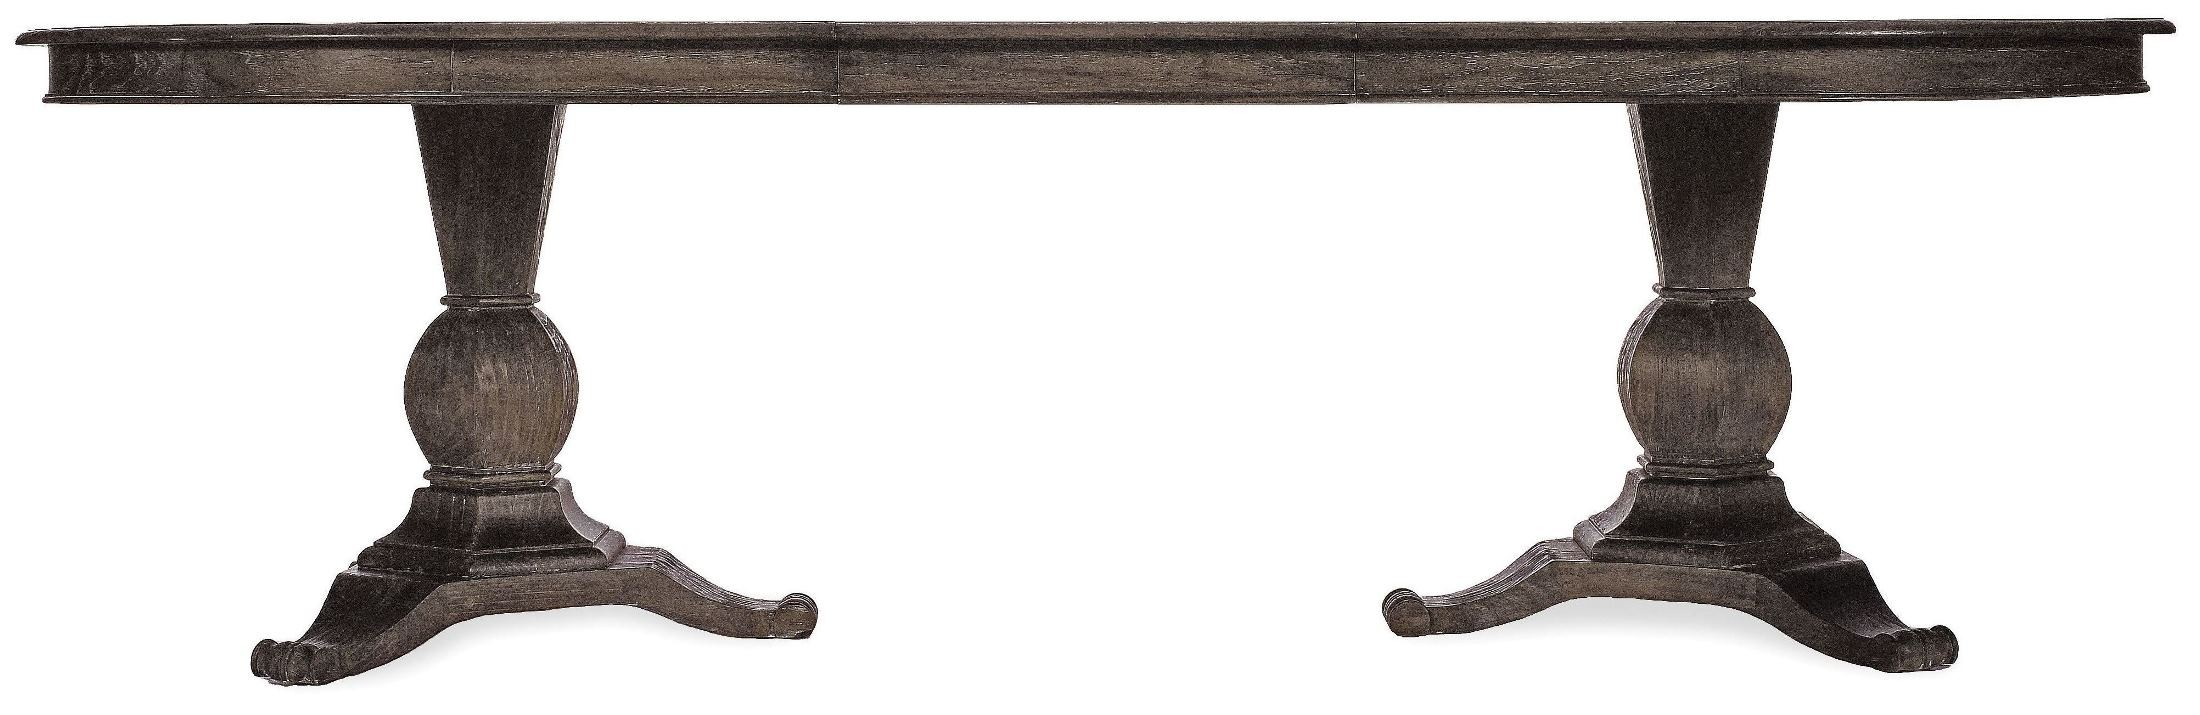 St germain rectangular double pedestal extendable dining for Rectangular pedestal dining table